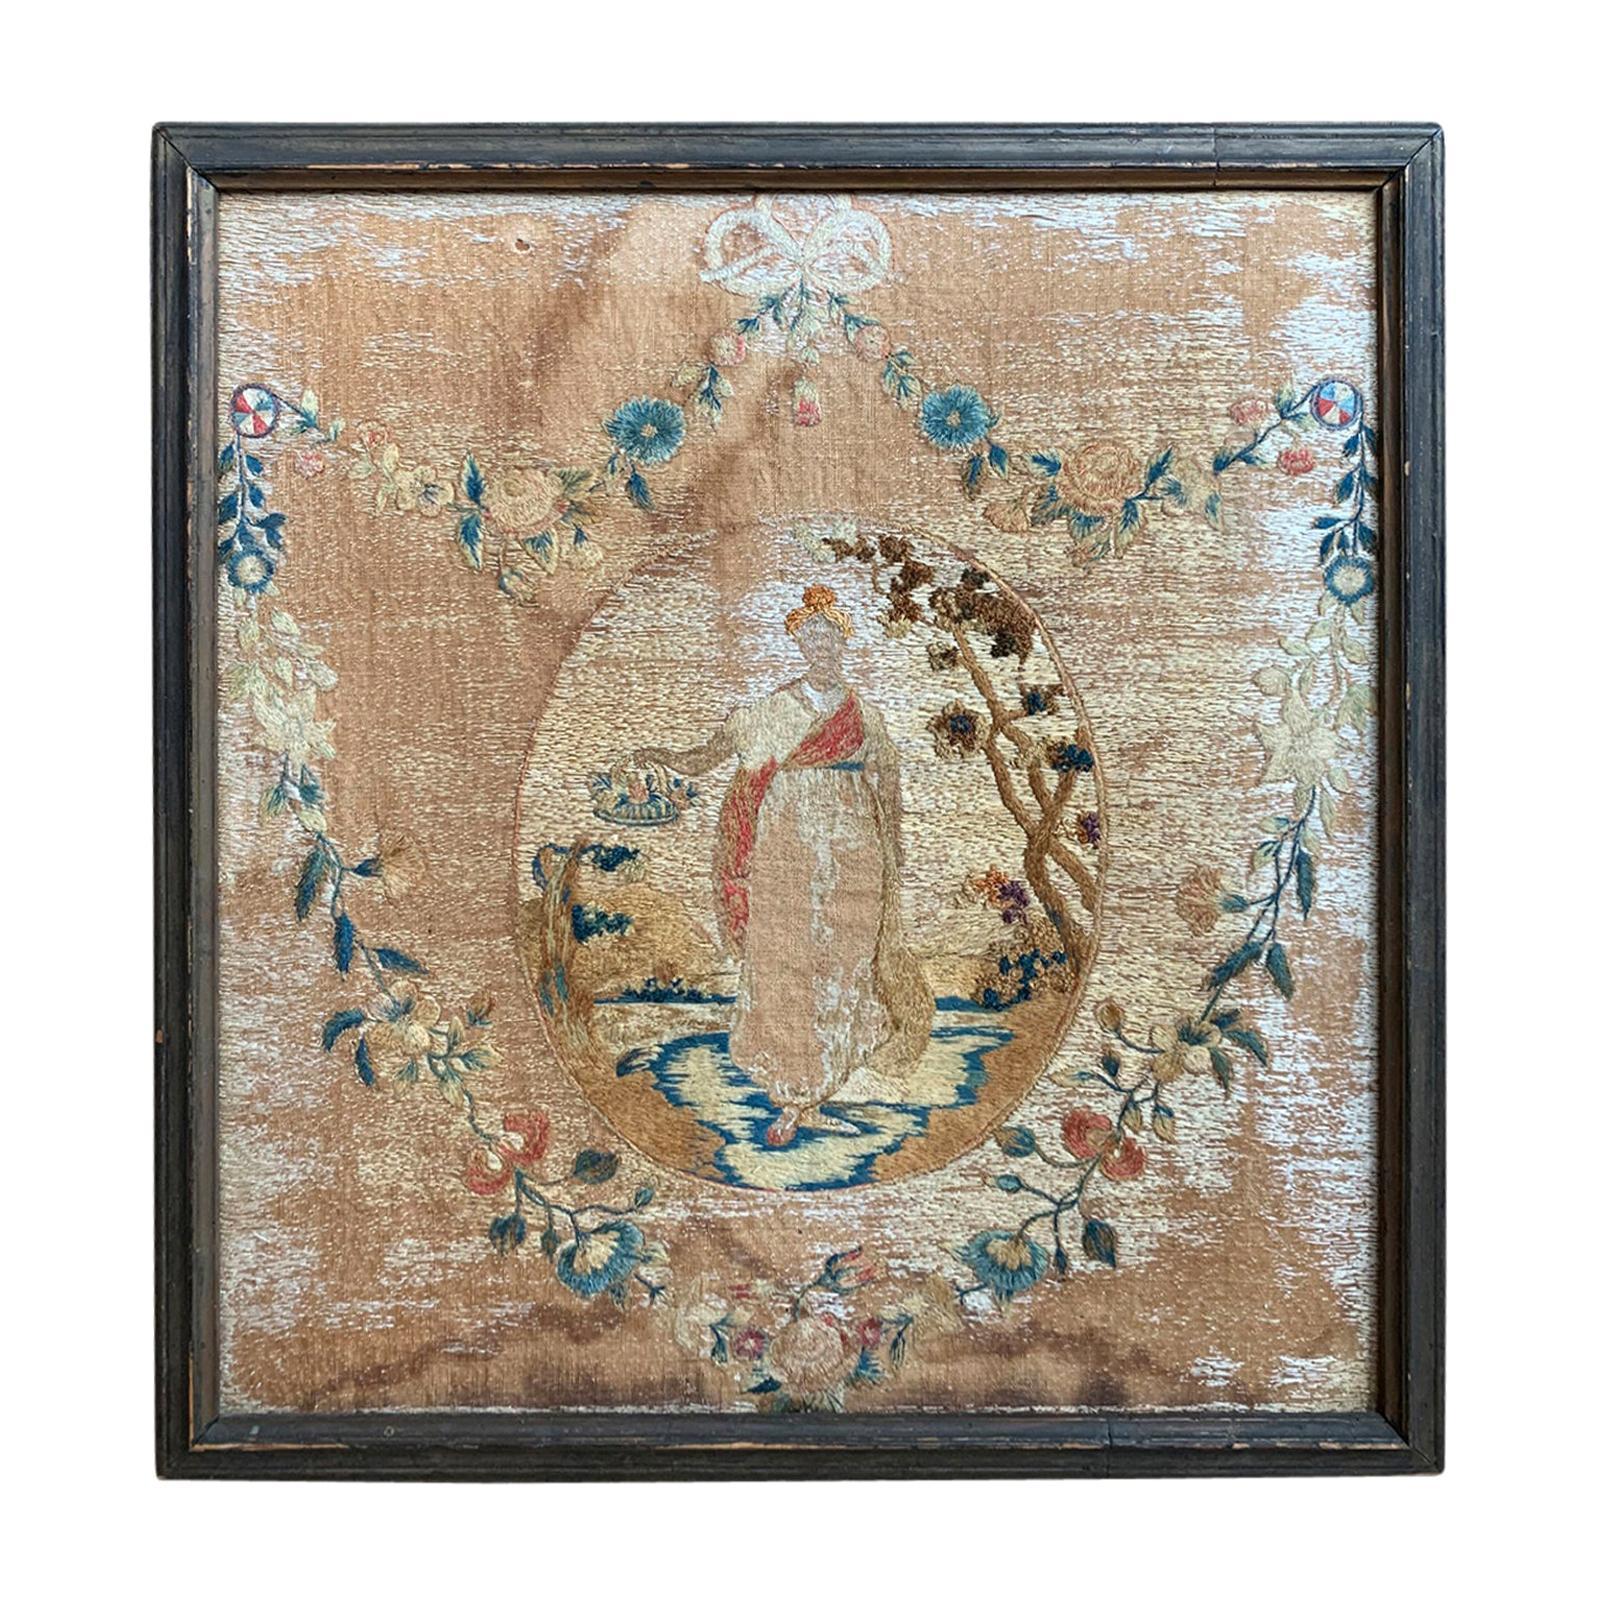 19th Century English Framed Needlework